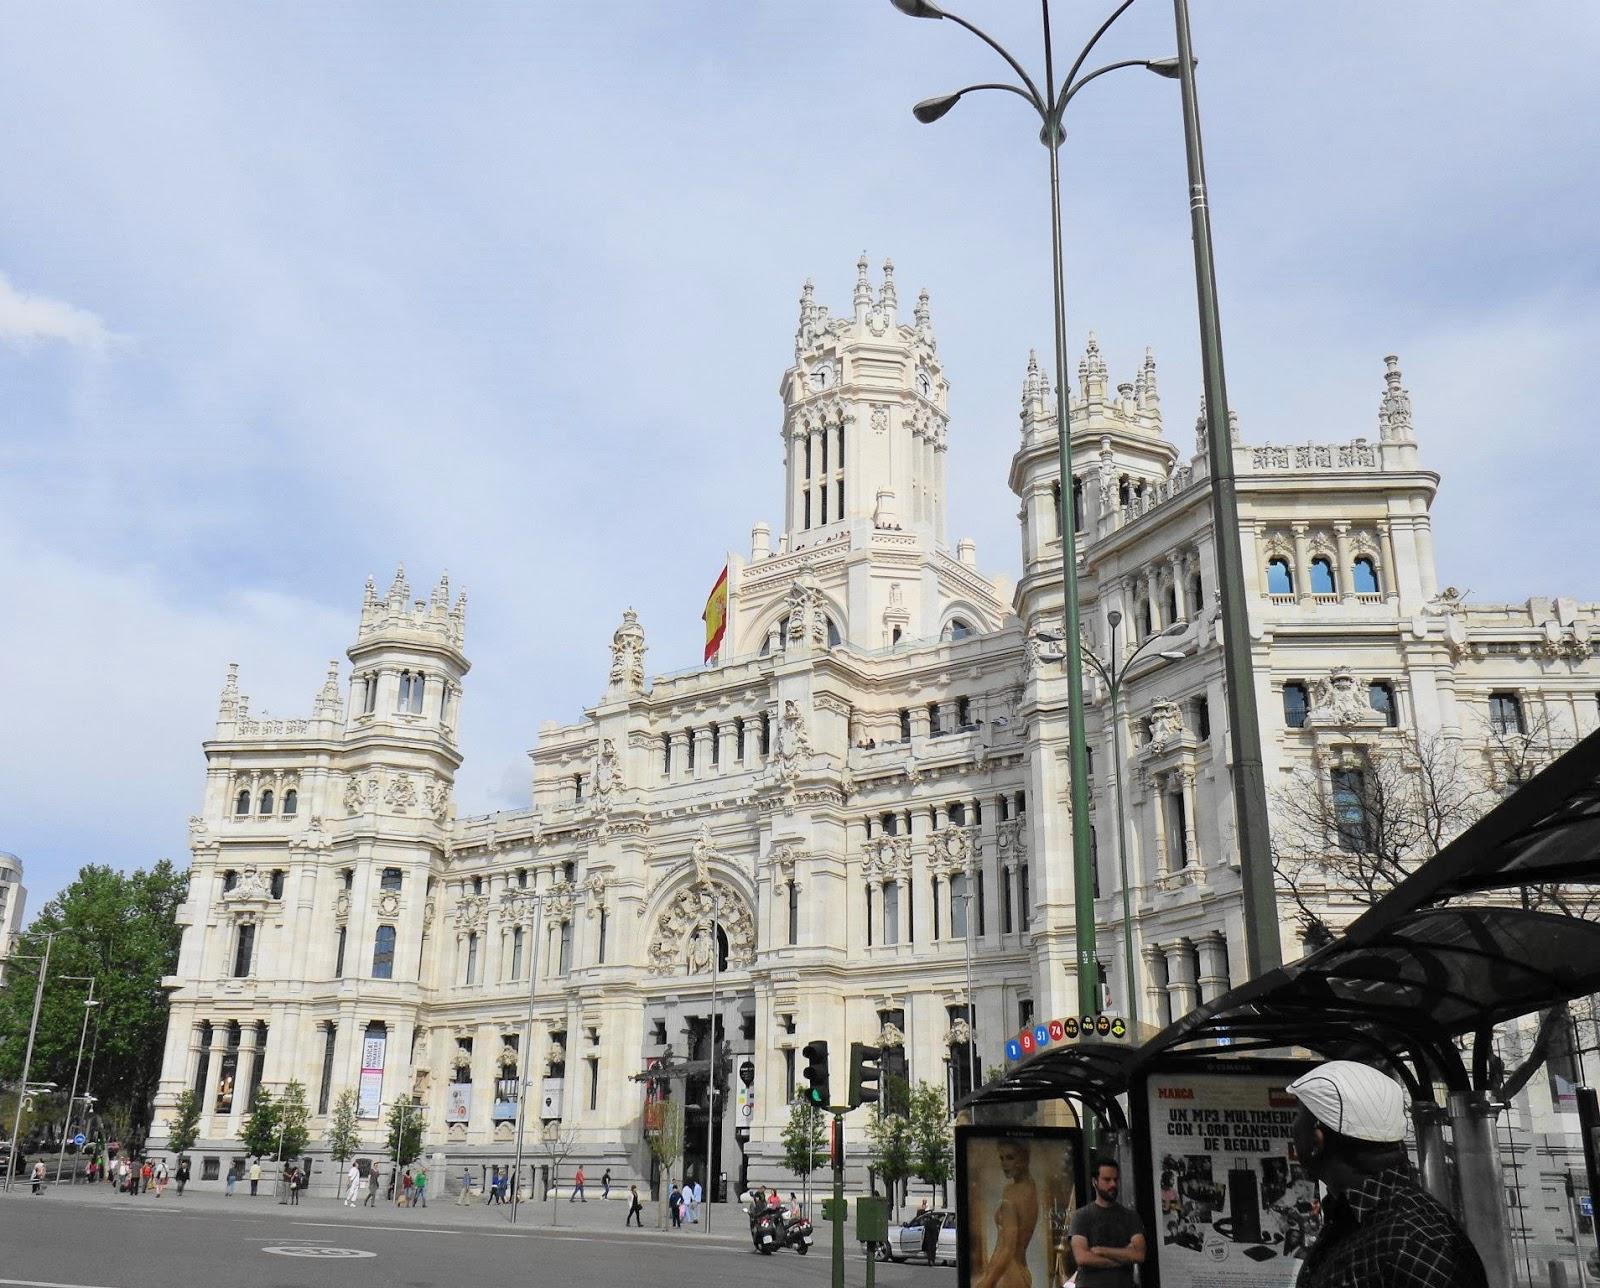 ¿Piensas viajar a Madrid?